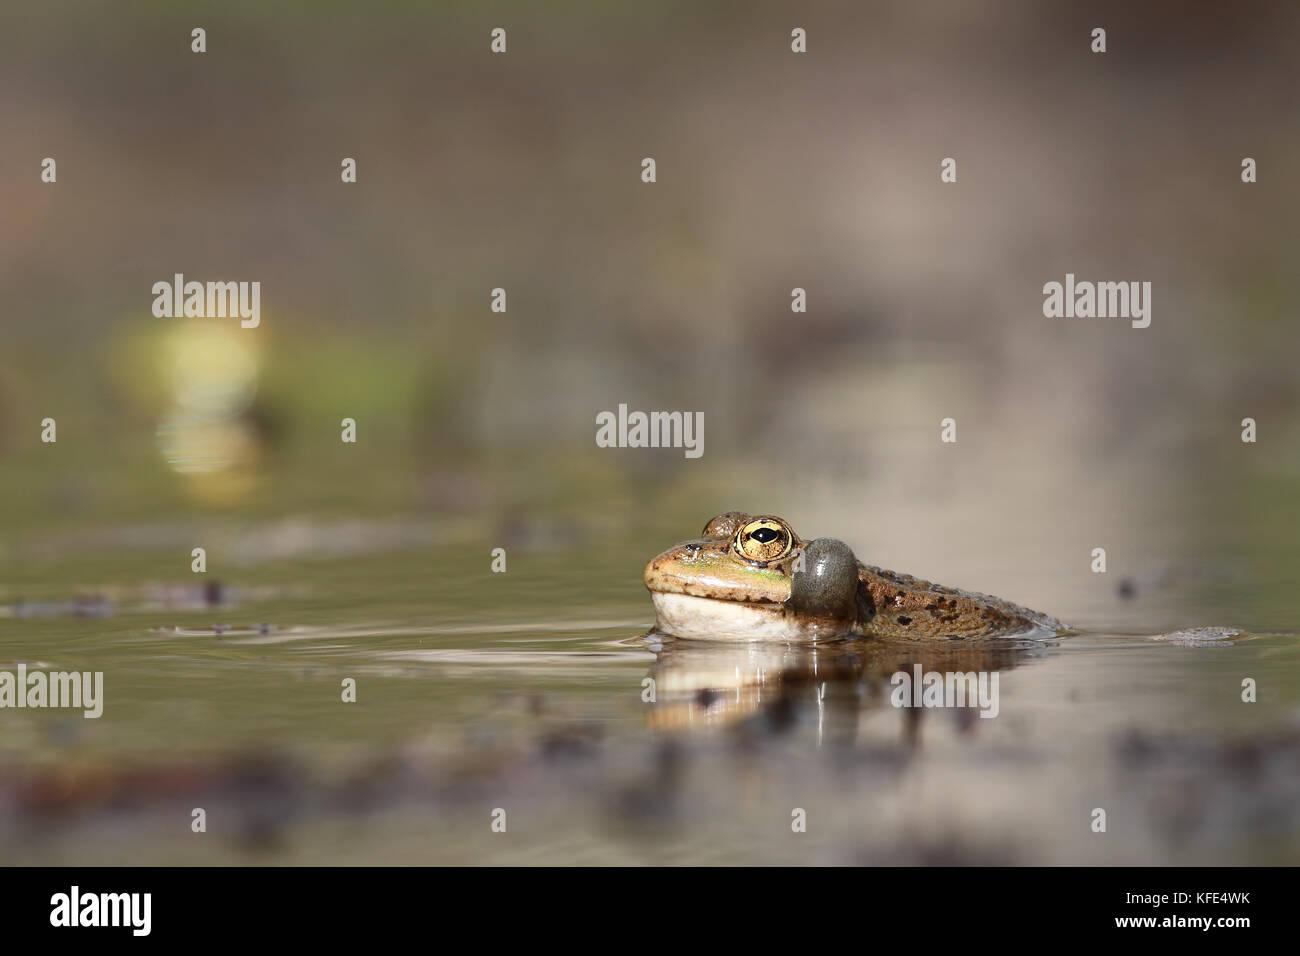 Perez's frog (Pelophylax perezi) croaking - Stock Image